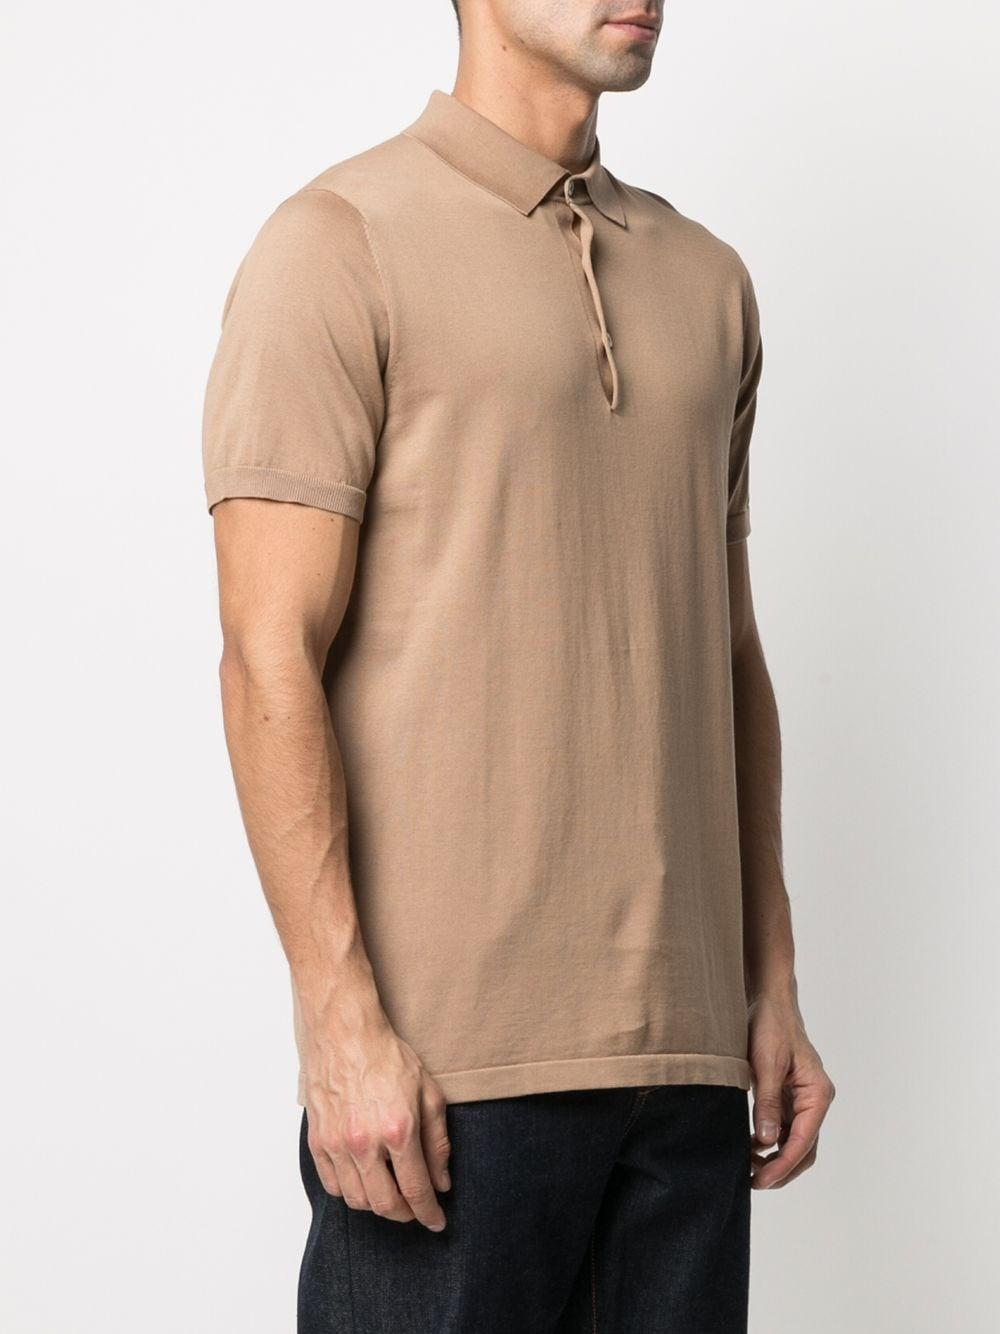 Aspesi polo in maglia uomo ASPESI   Polo   M040 337101090